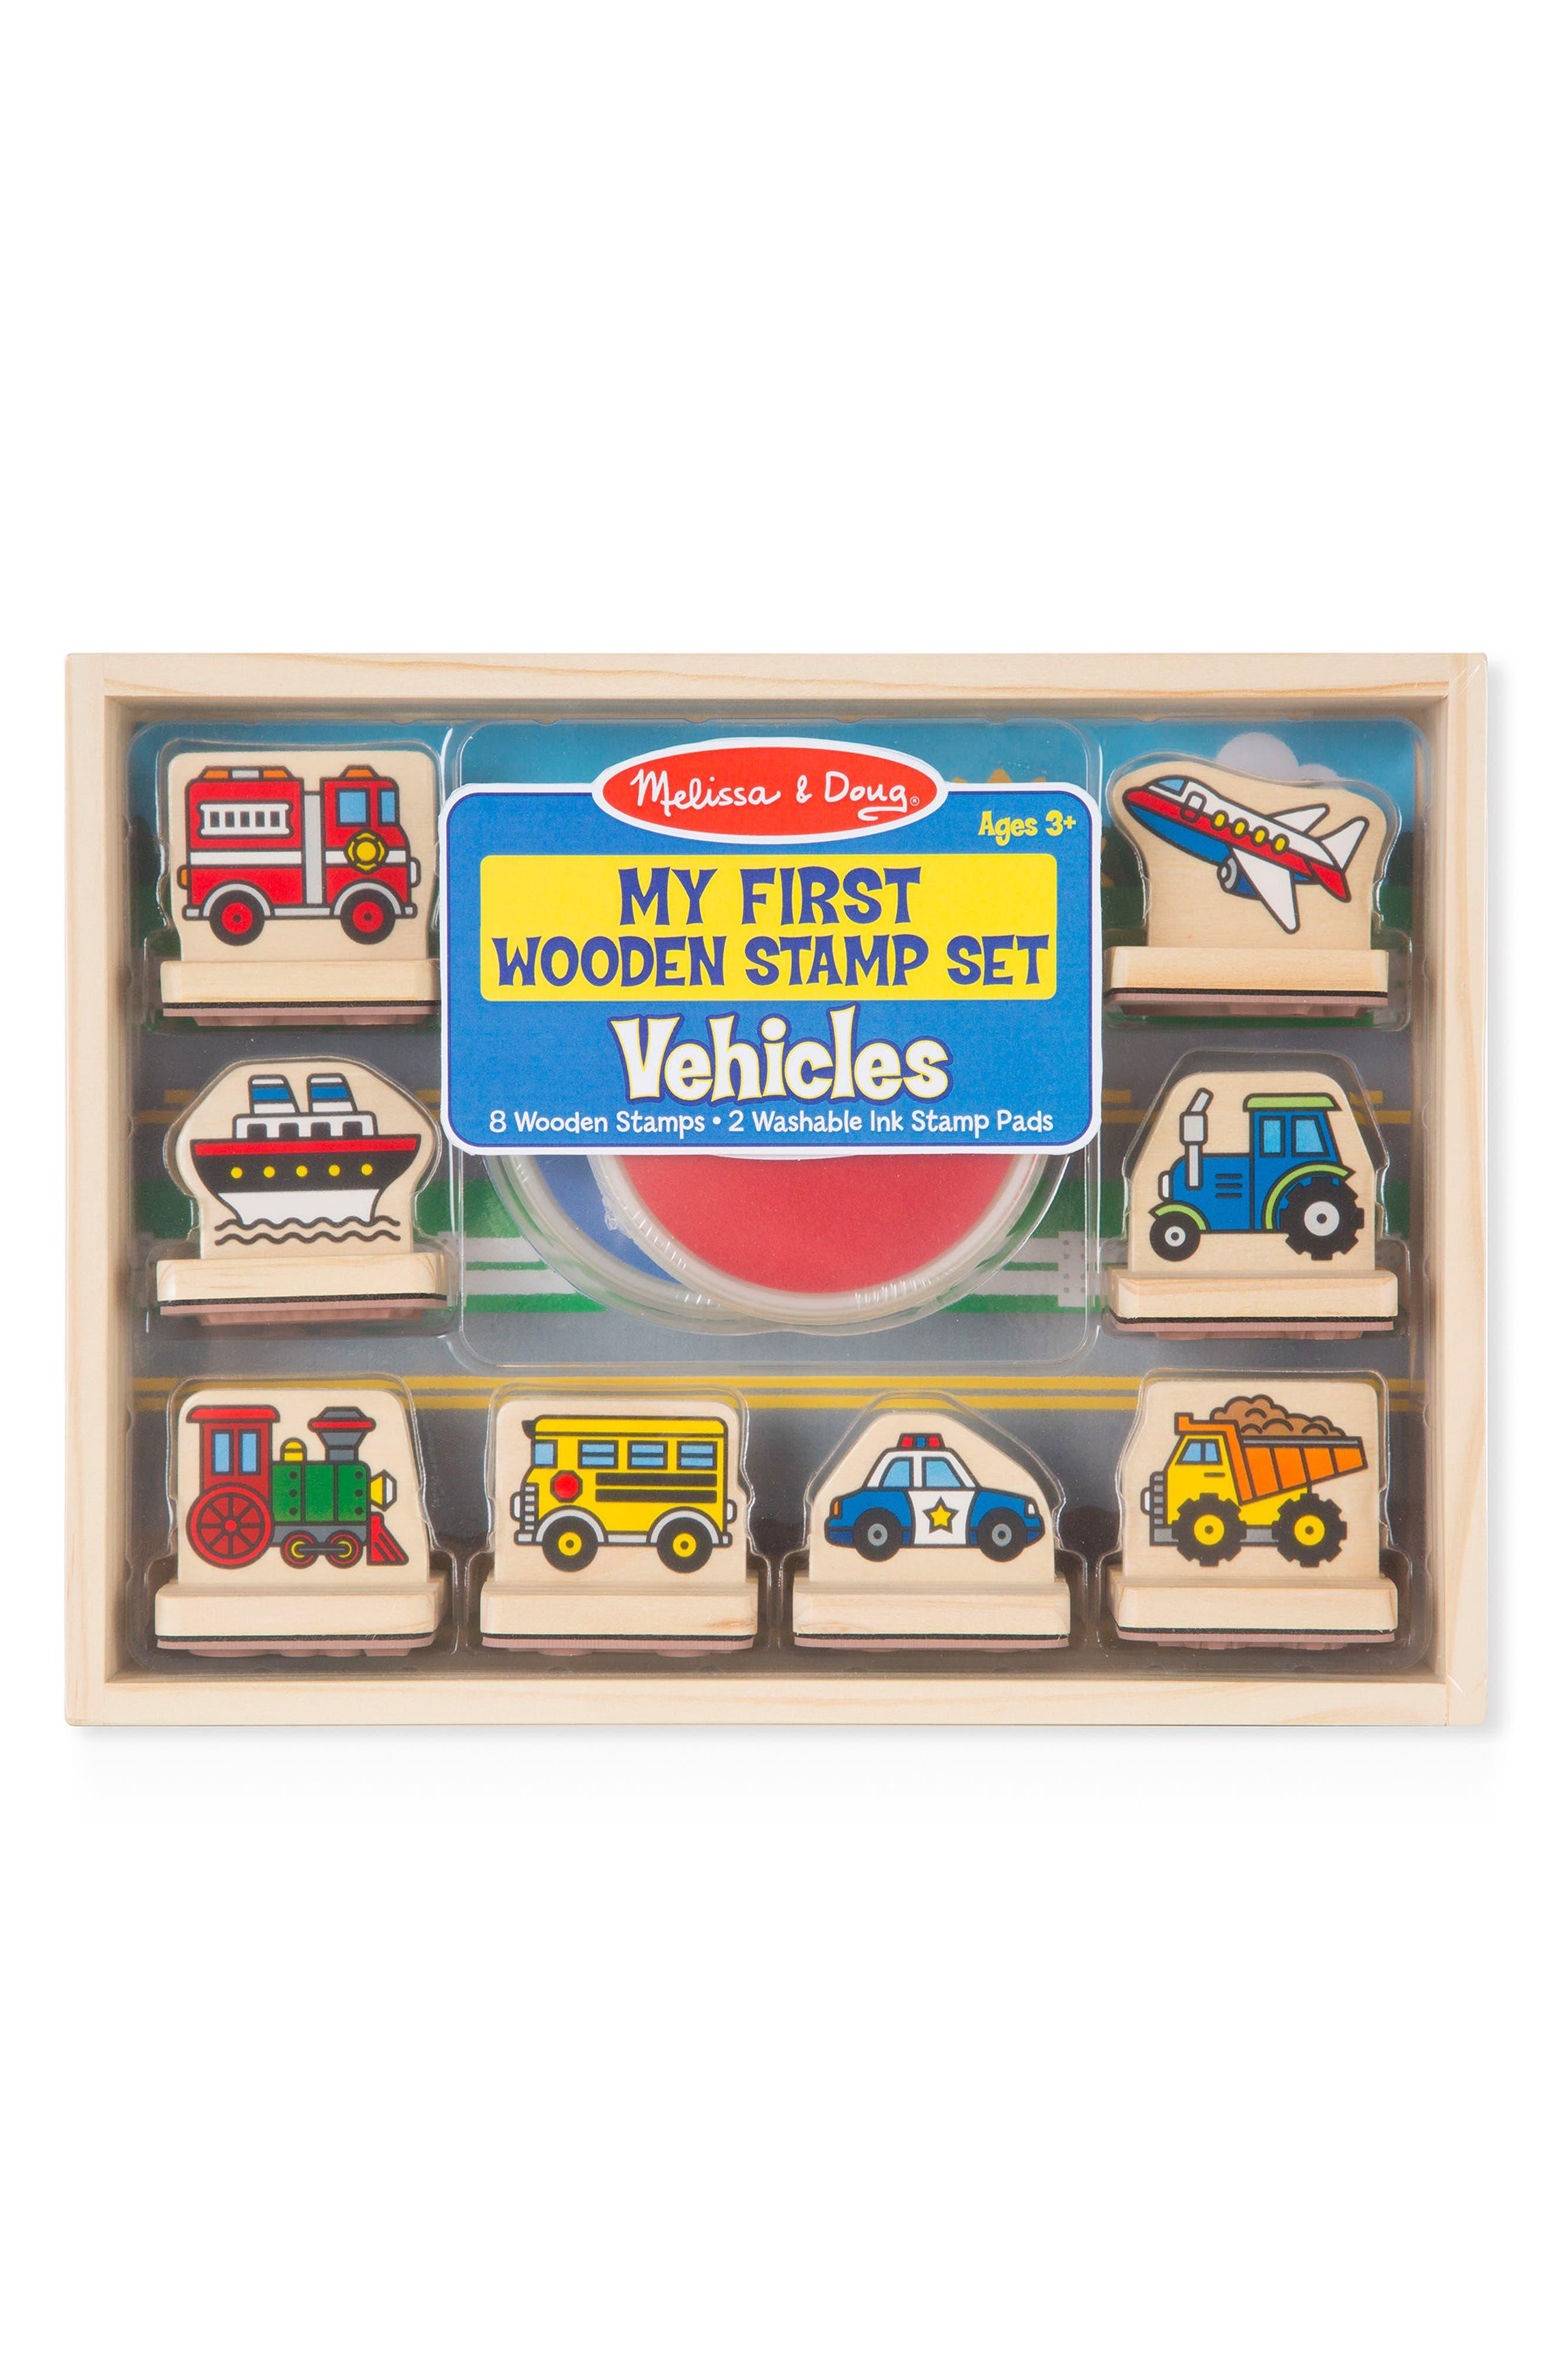 Melissa & Doug 10-Piece My First Wooden Stamp Set - Vehicles